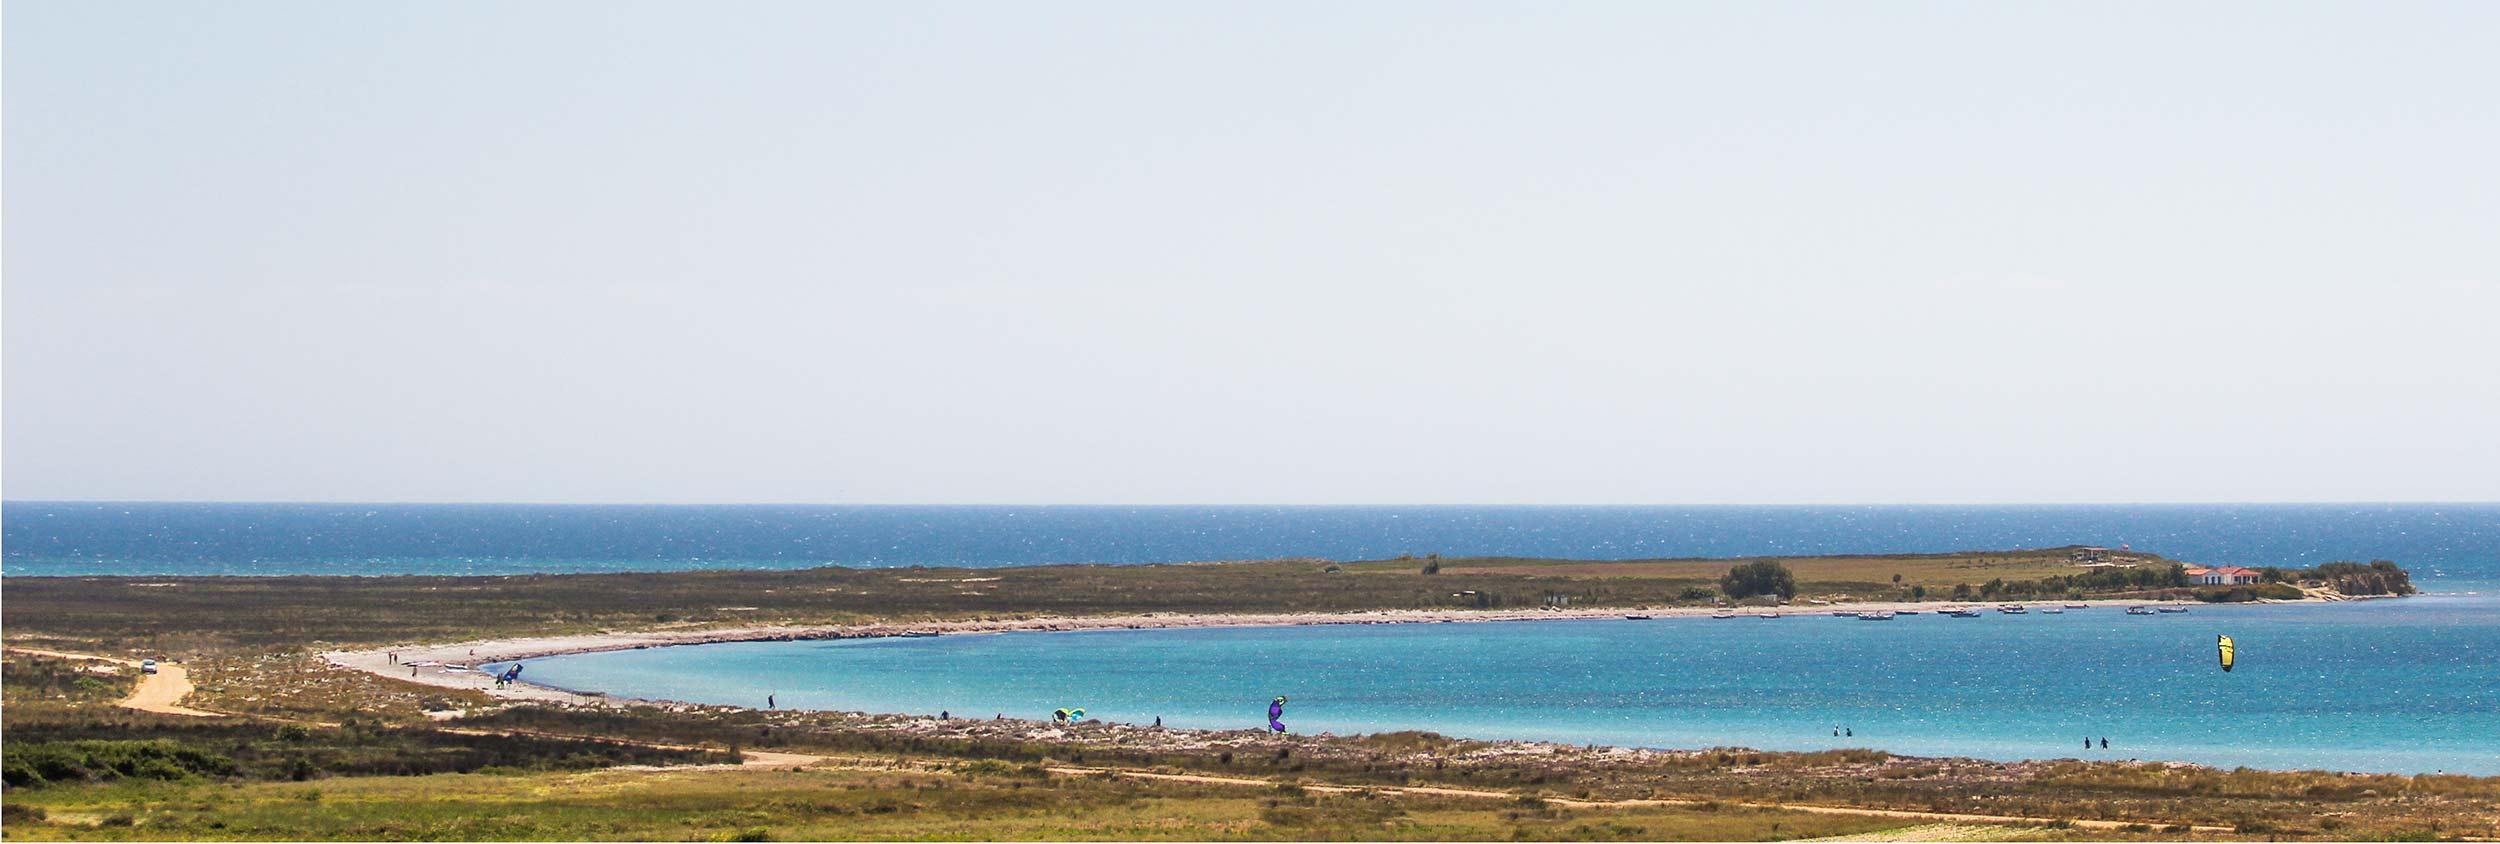 kitesurfing, kiteboarding in Keros bay, limnos, greece with surf club keros